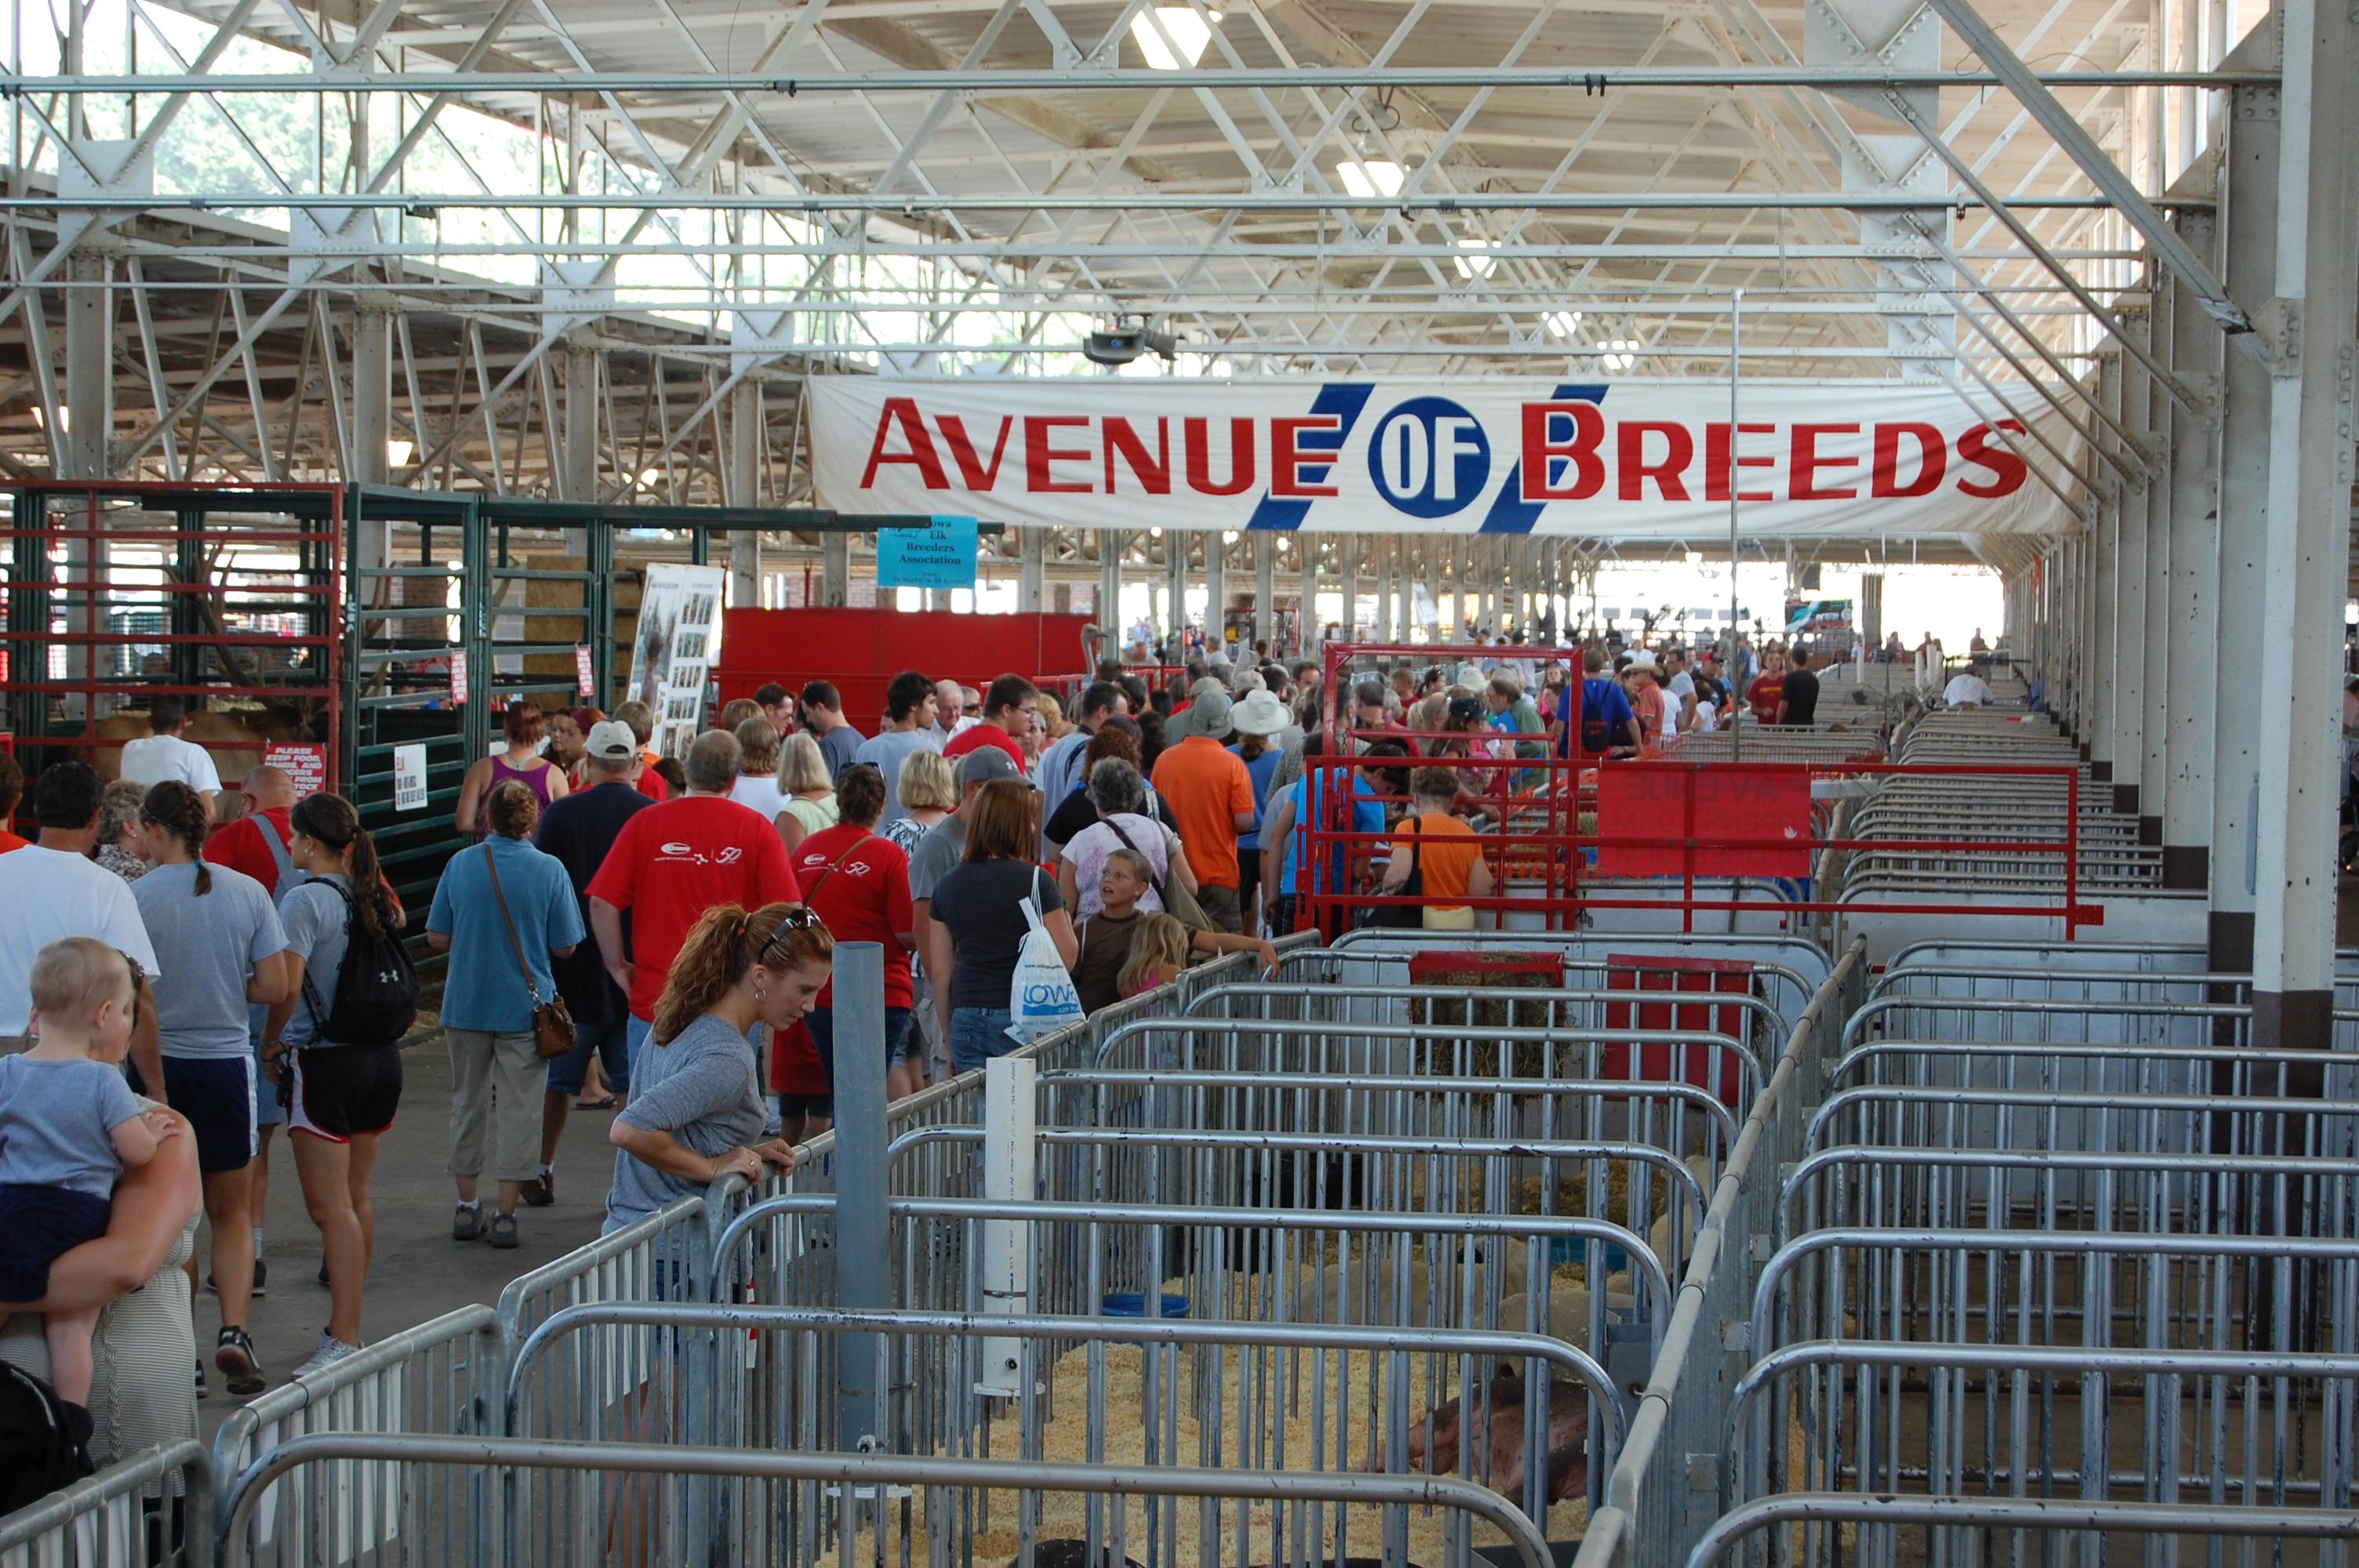 Avenue of Breeds